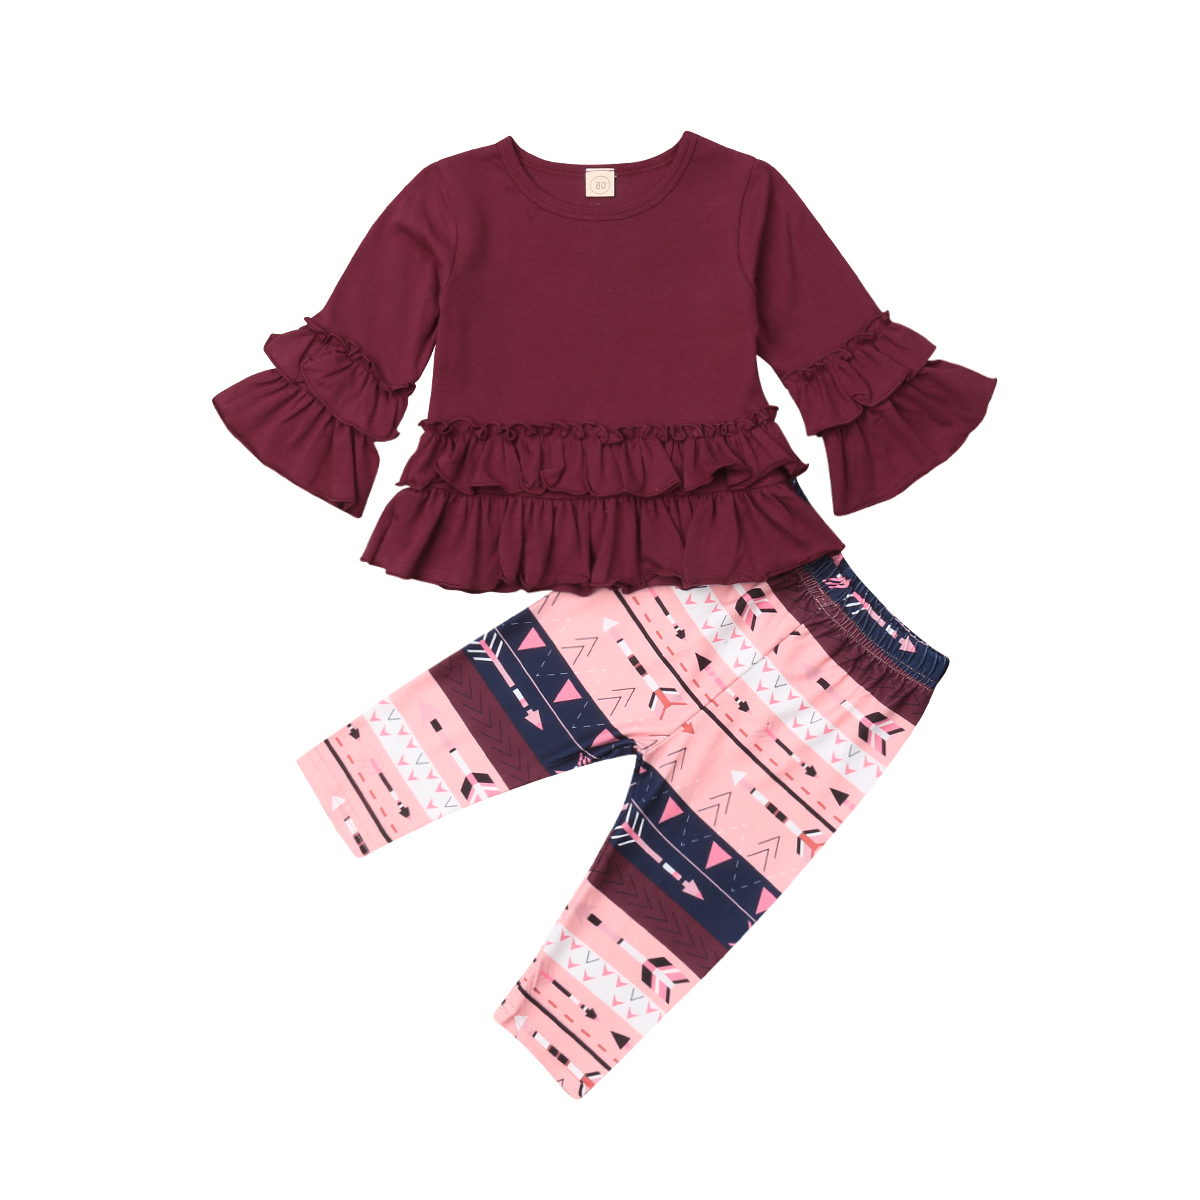 Toddler Kids Girls Infant Romper Playsuit Floral Pants 2Pcs Outfits Set Clothes